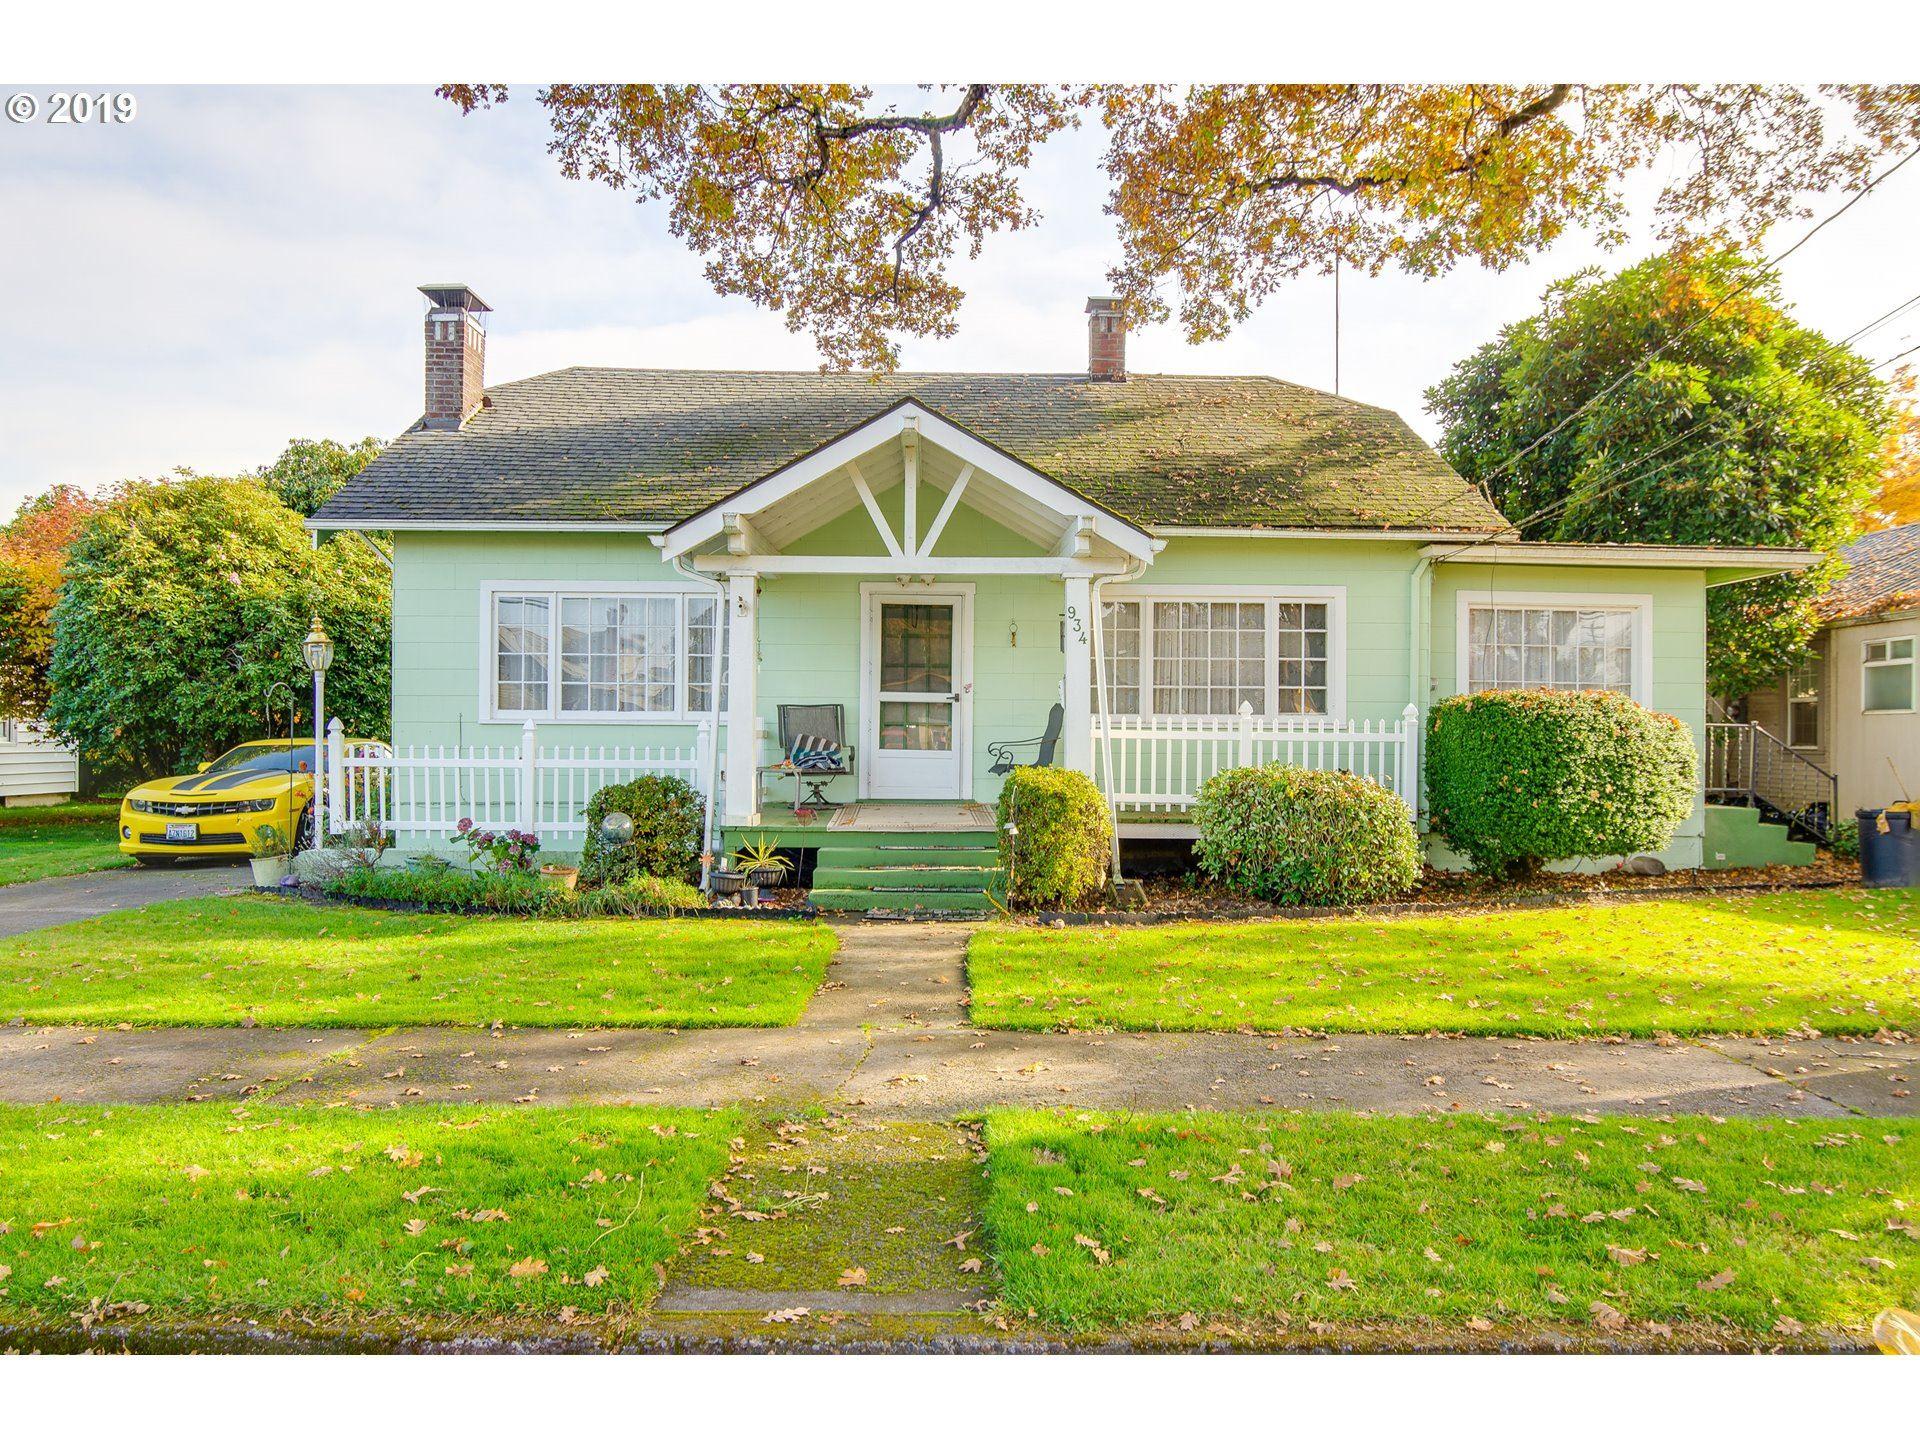 934 Hoffman St, Woodland, WA 98674 - MLS#: 19375778